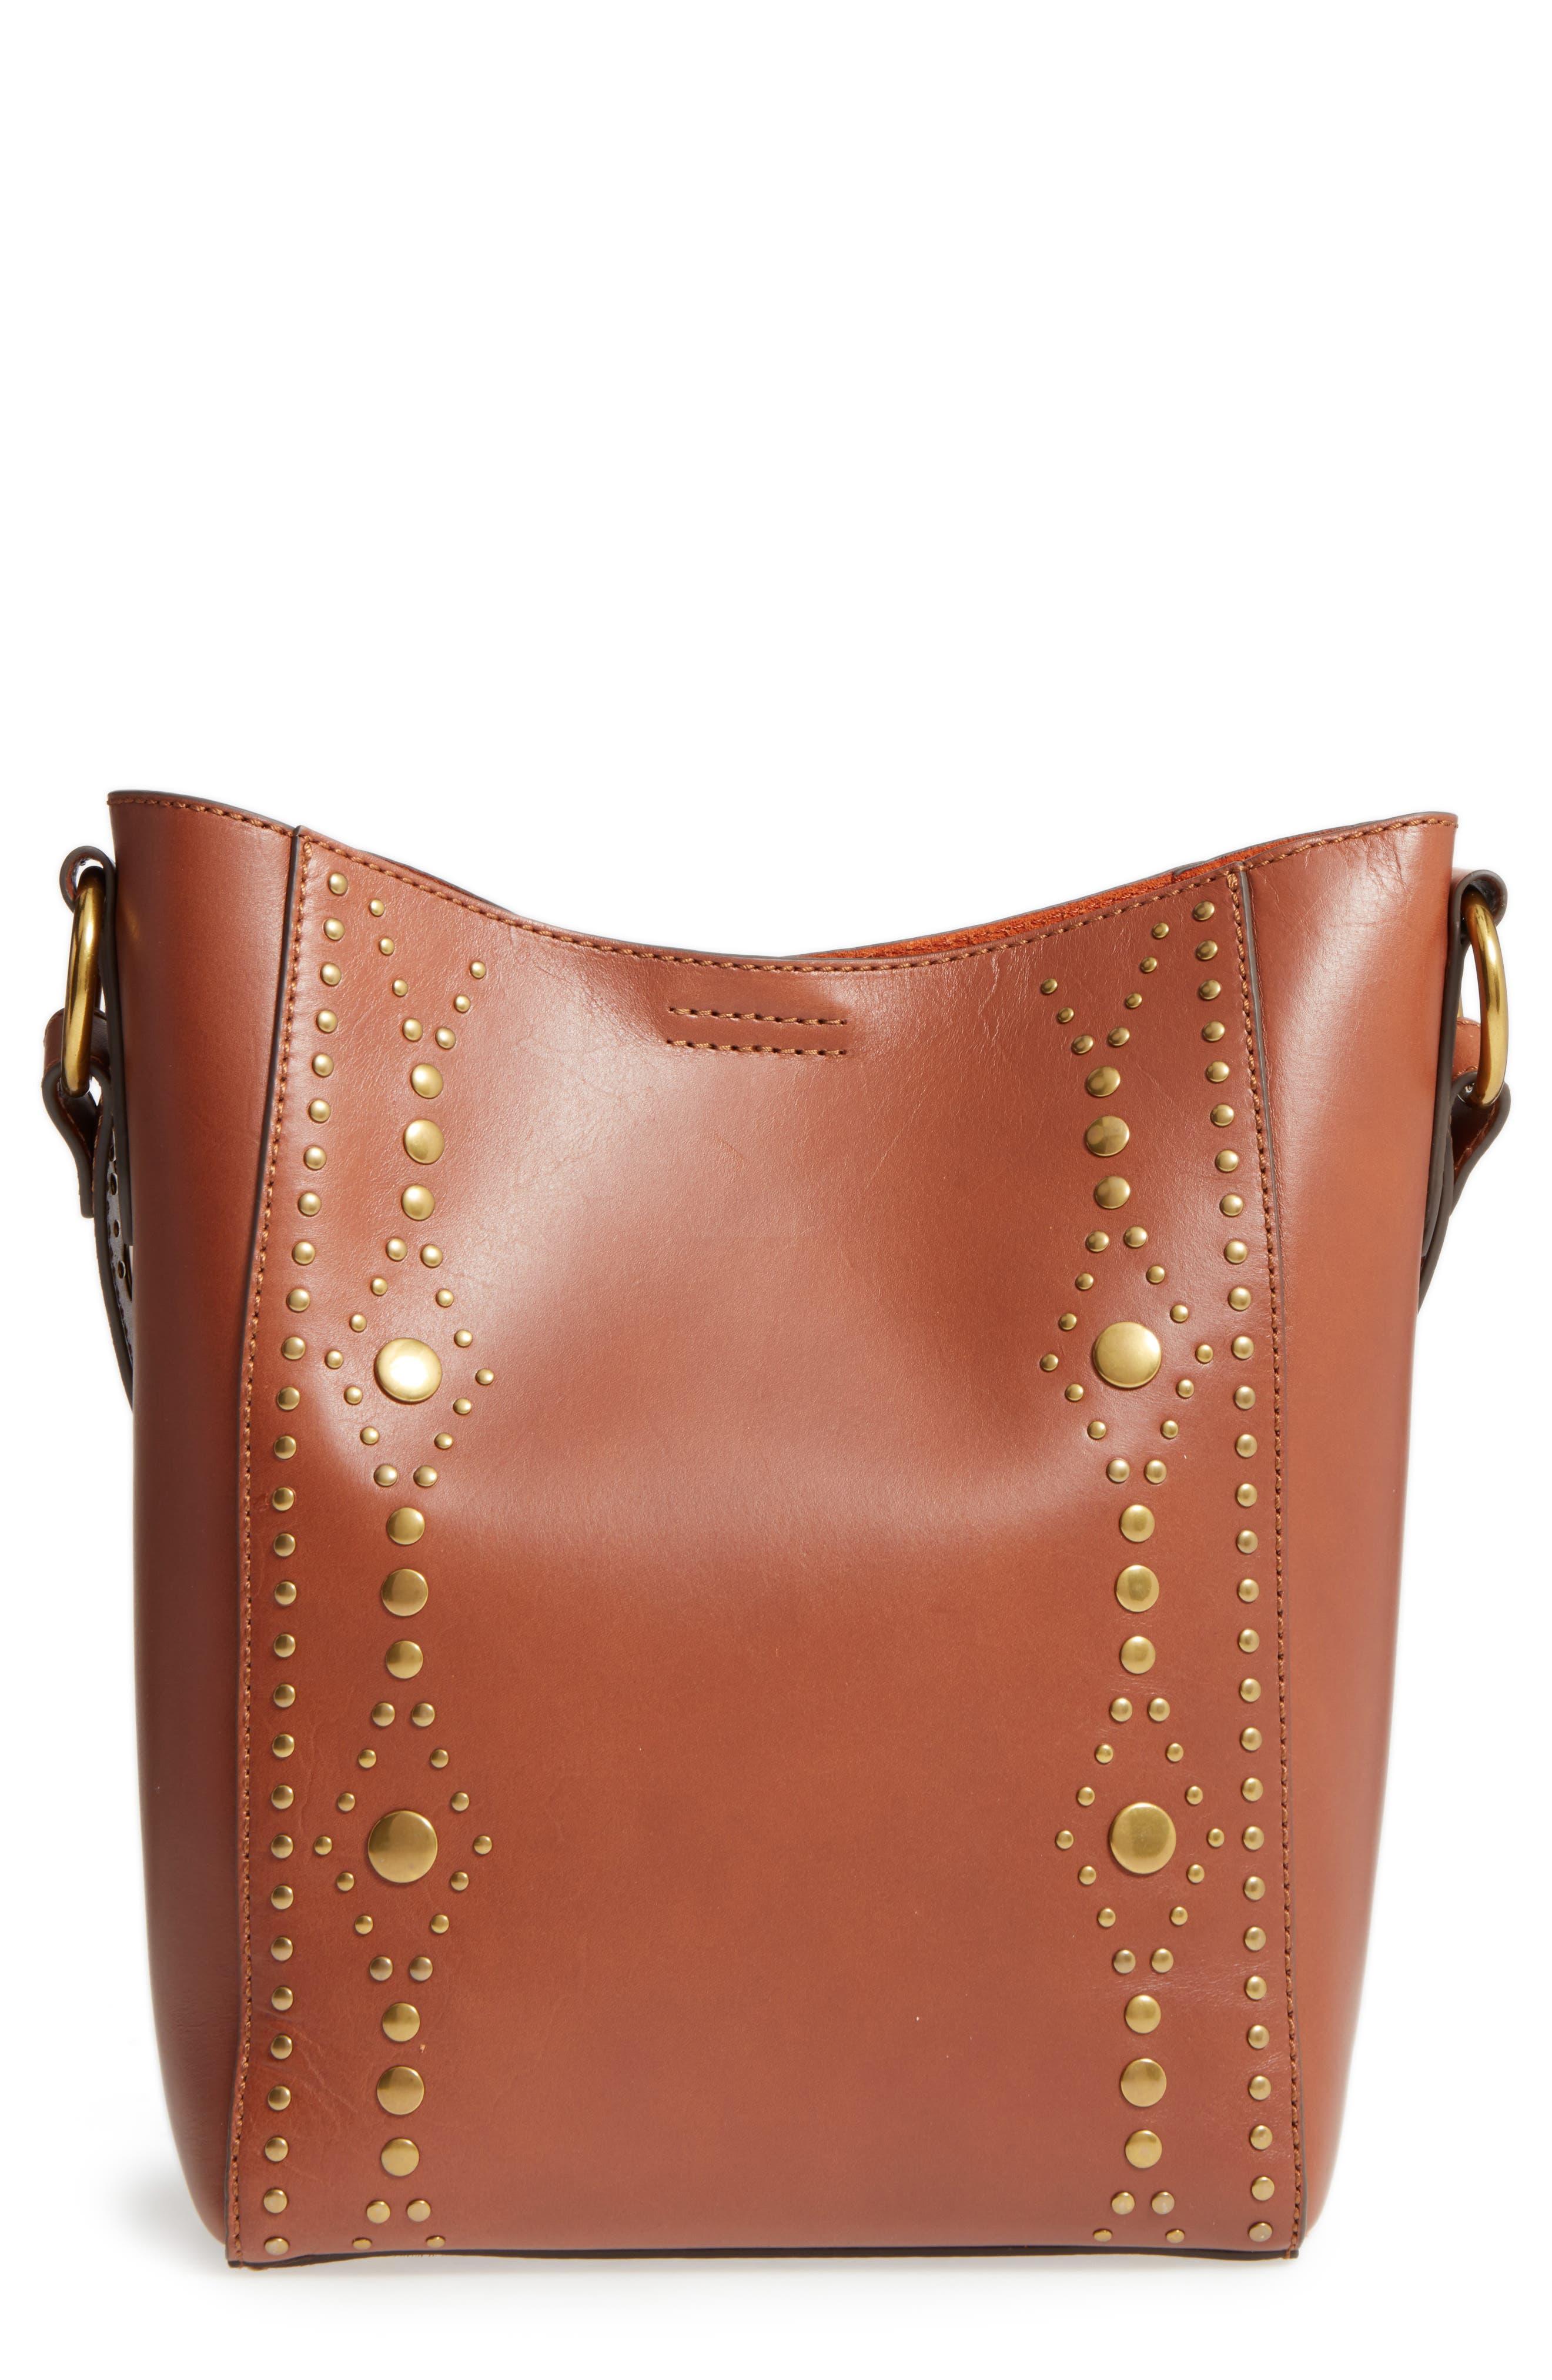 Frye Harness Calfskin Leather Bucket Bag